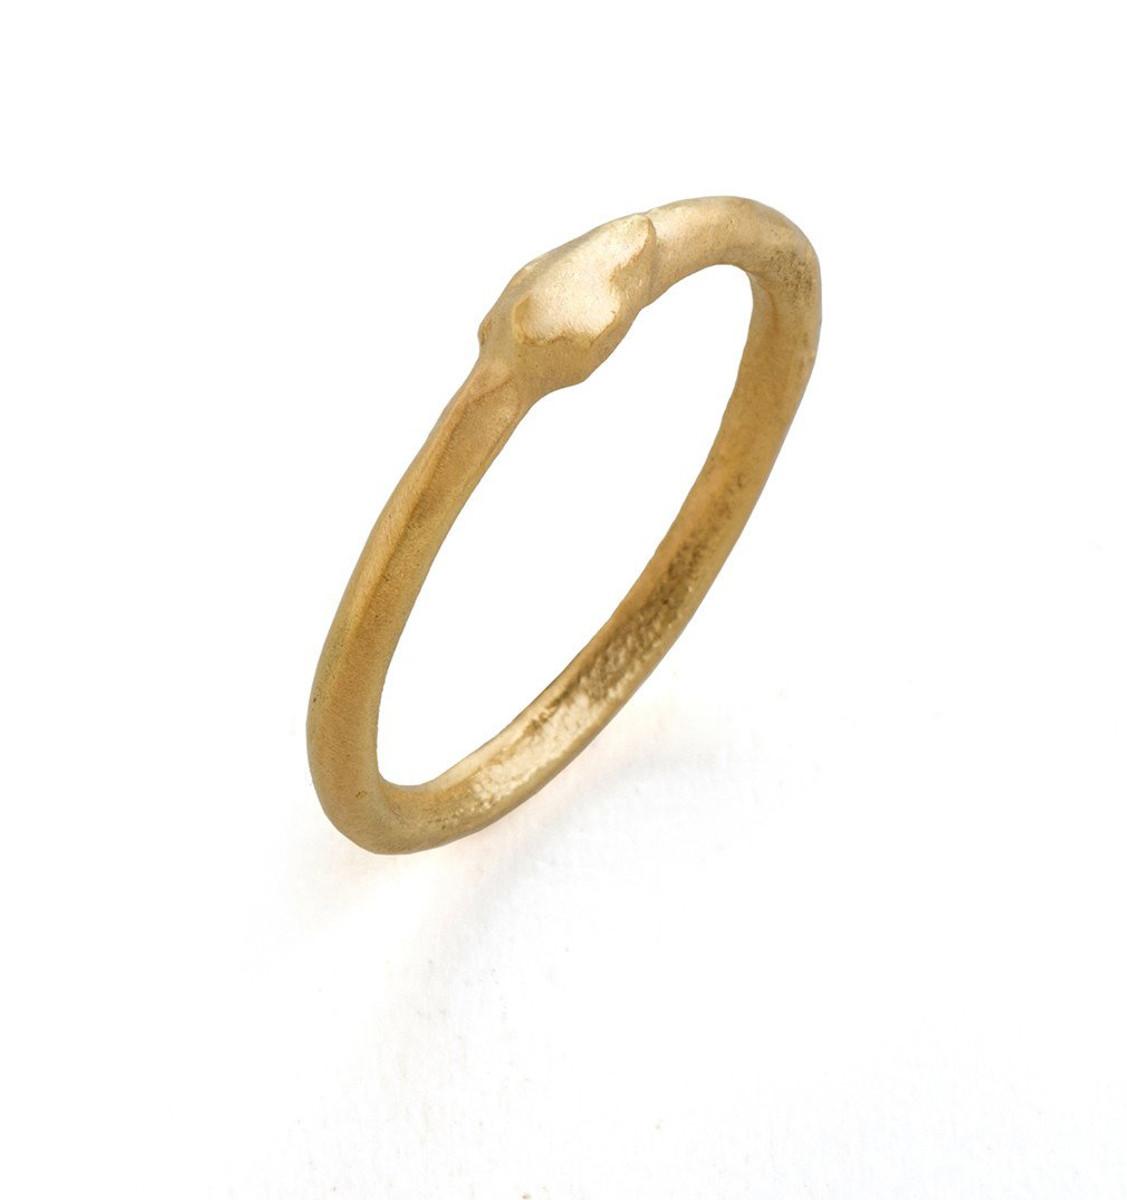 True Gold Ring by Nava Zahavi  - New Arrival